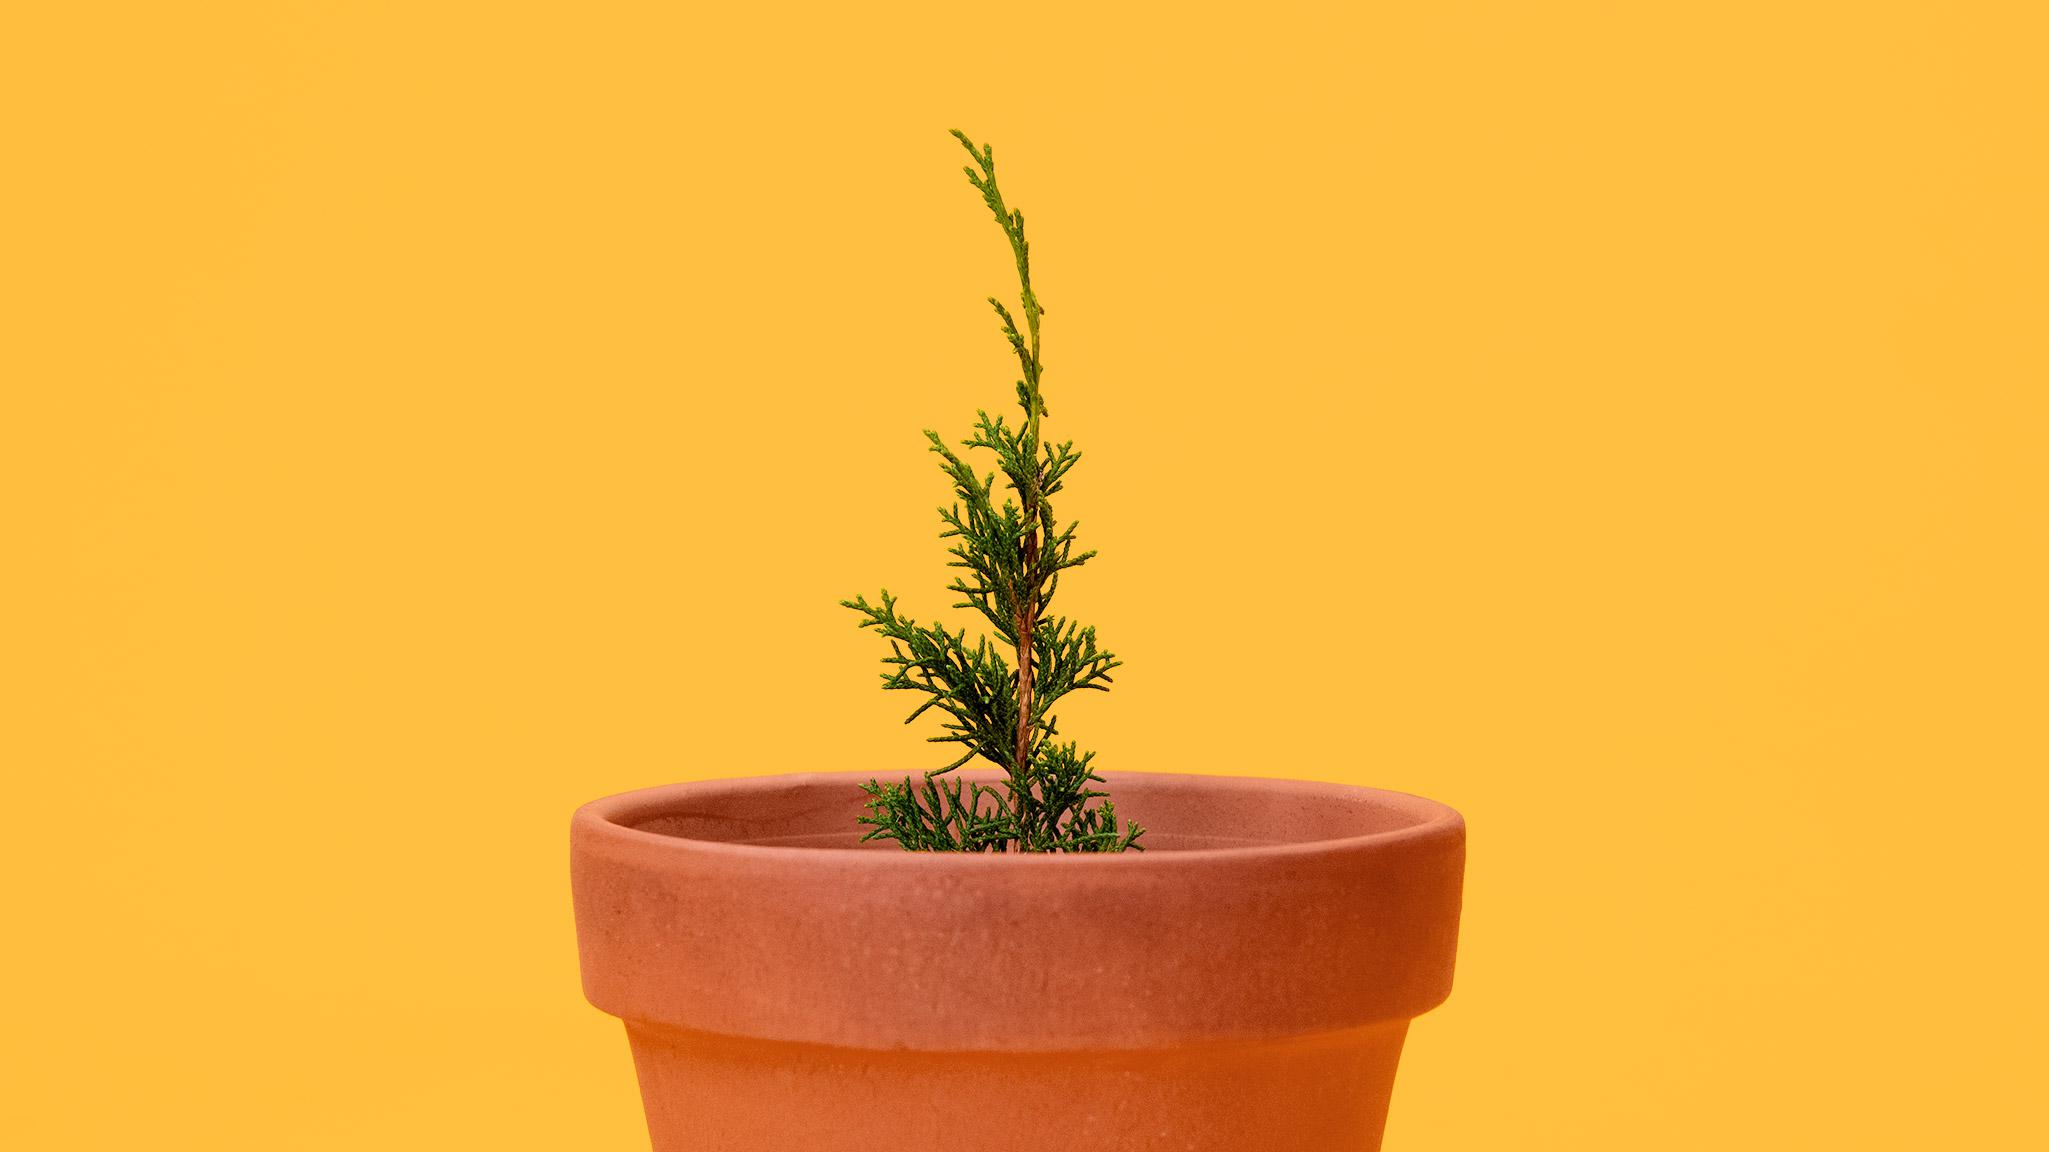 Bonsai Origins Mirai Wiring Juniper Tree